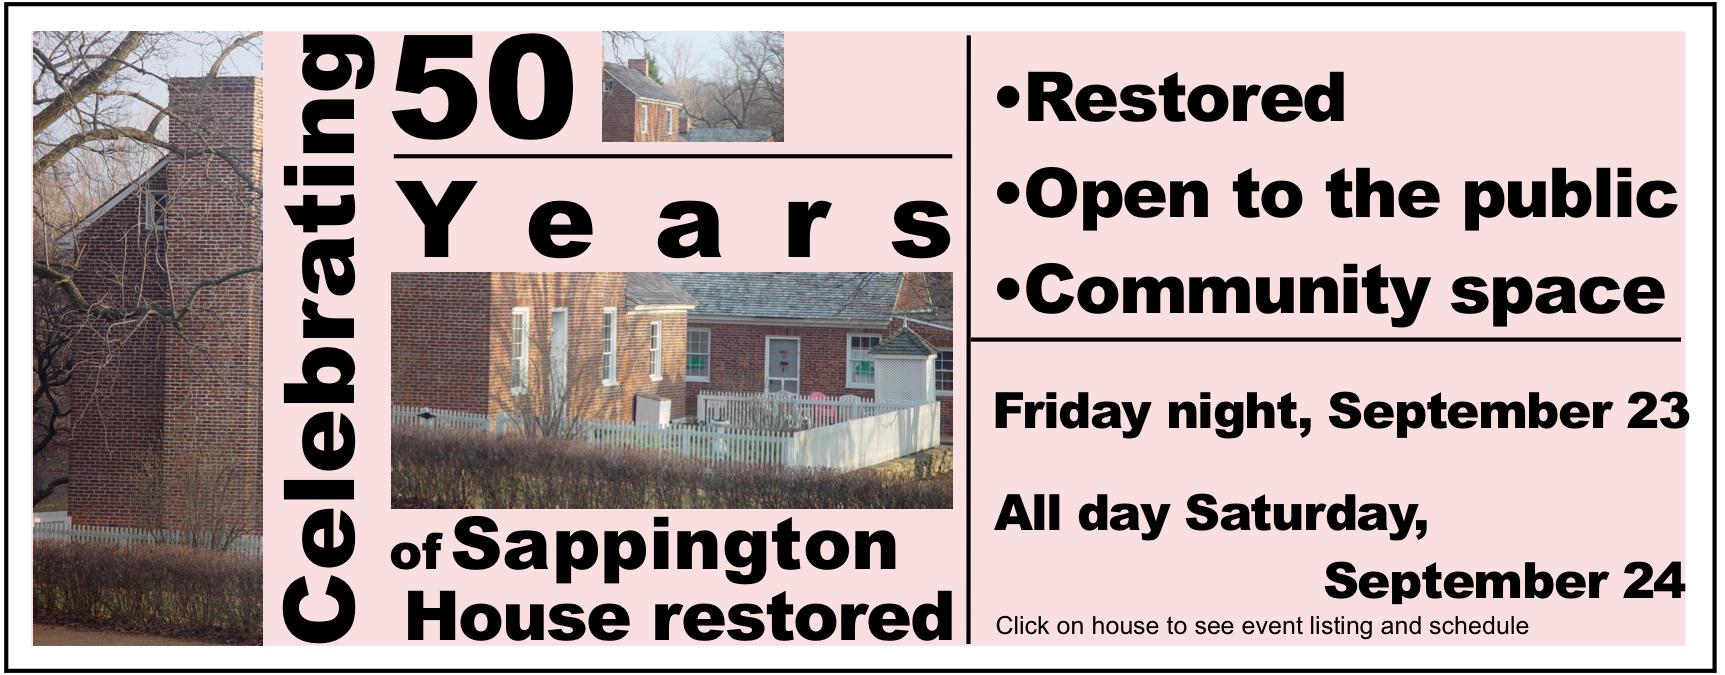 50th anniversary Sappington House restoration celebration, Friday and Saturday, September 23 and 24, 2016